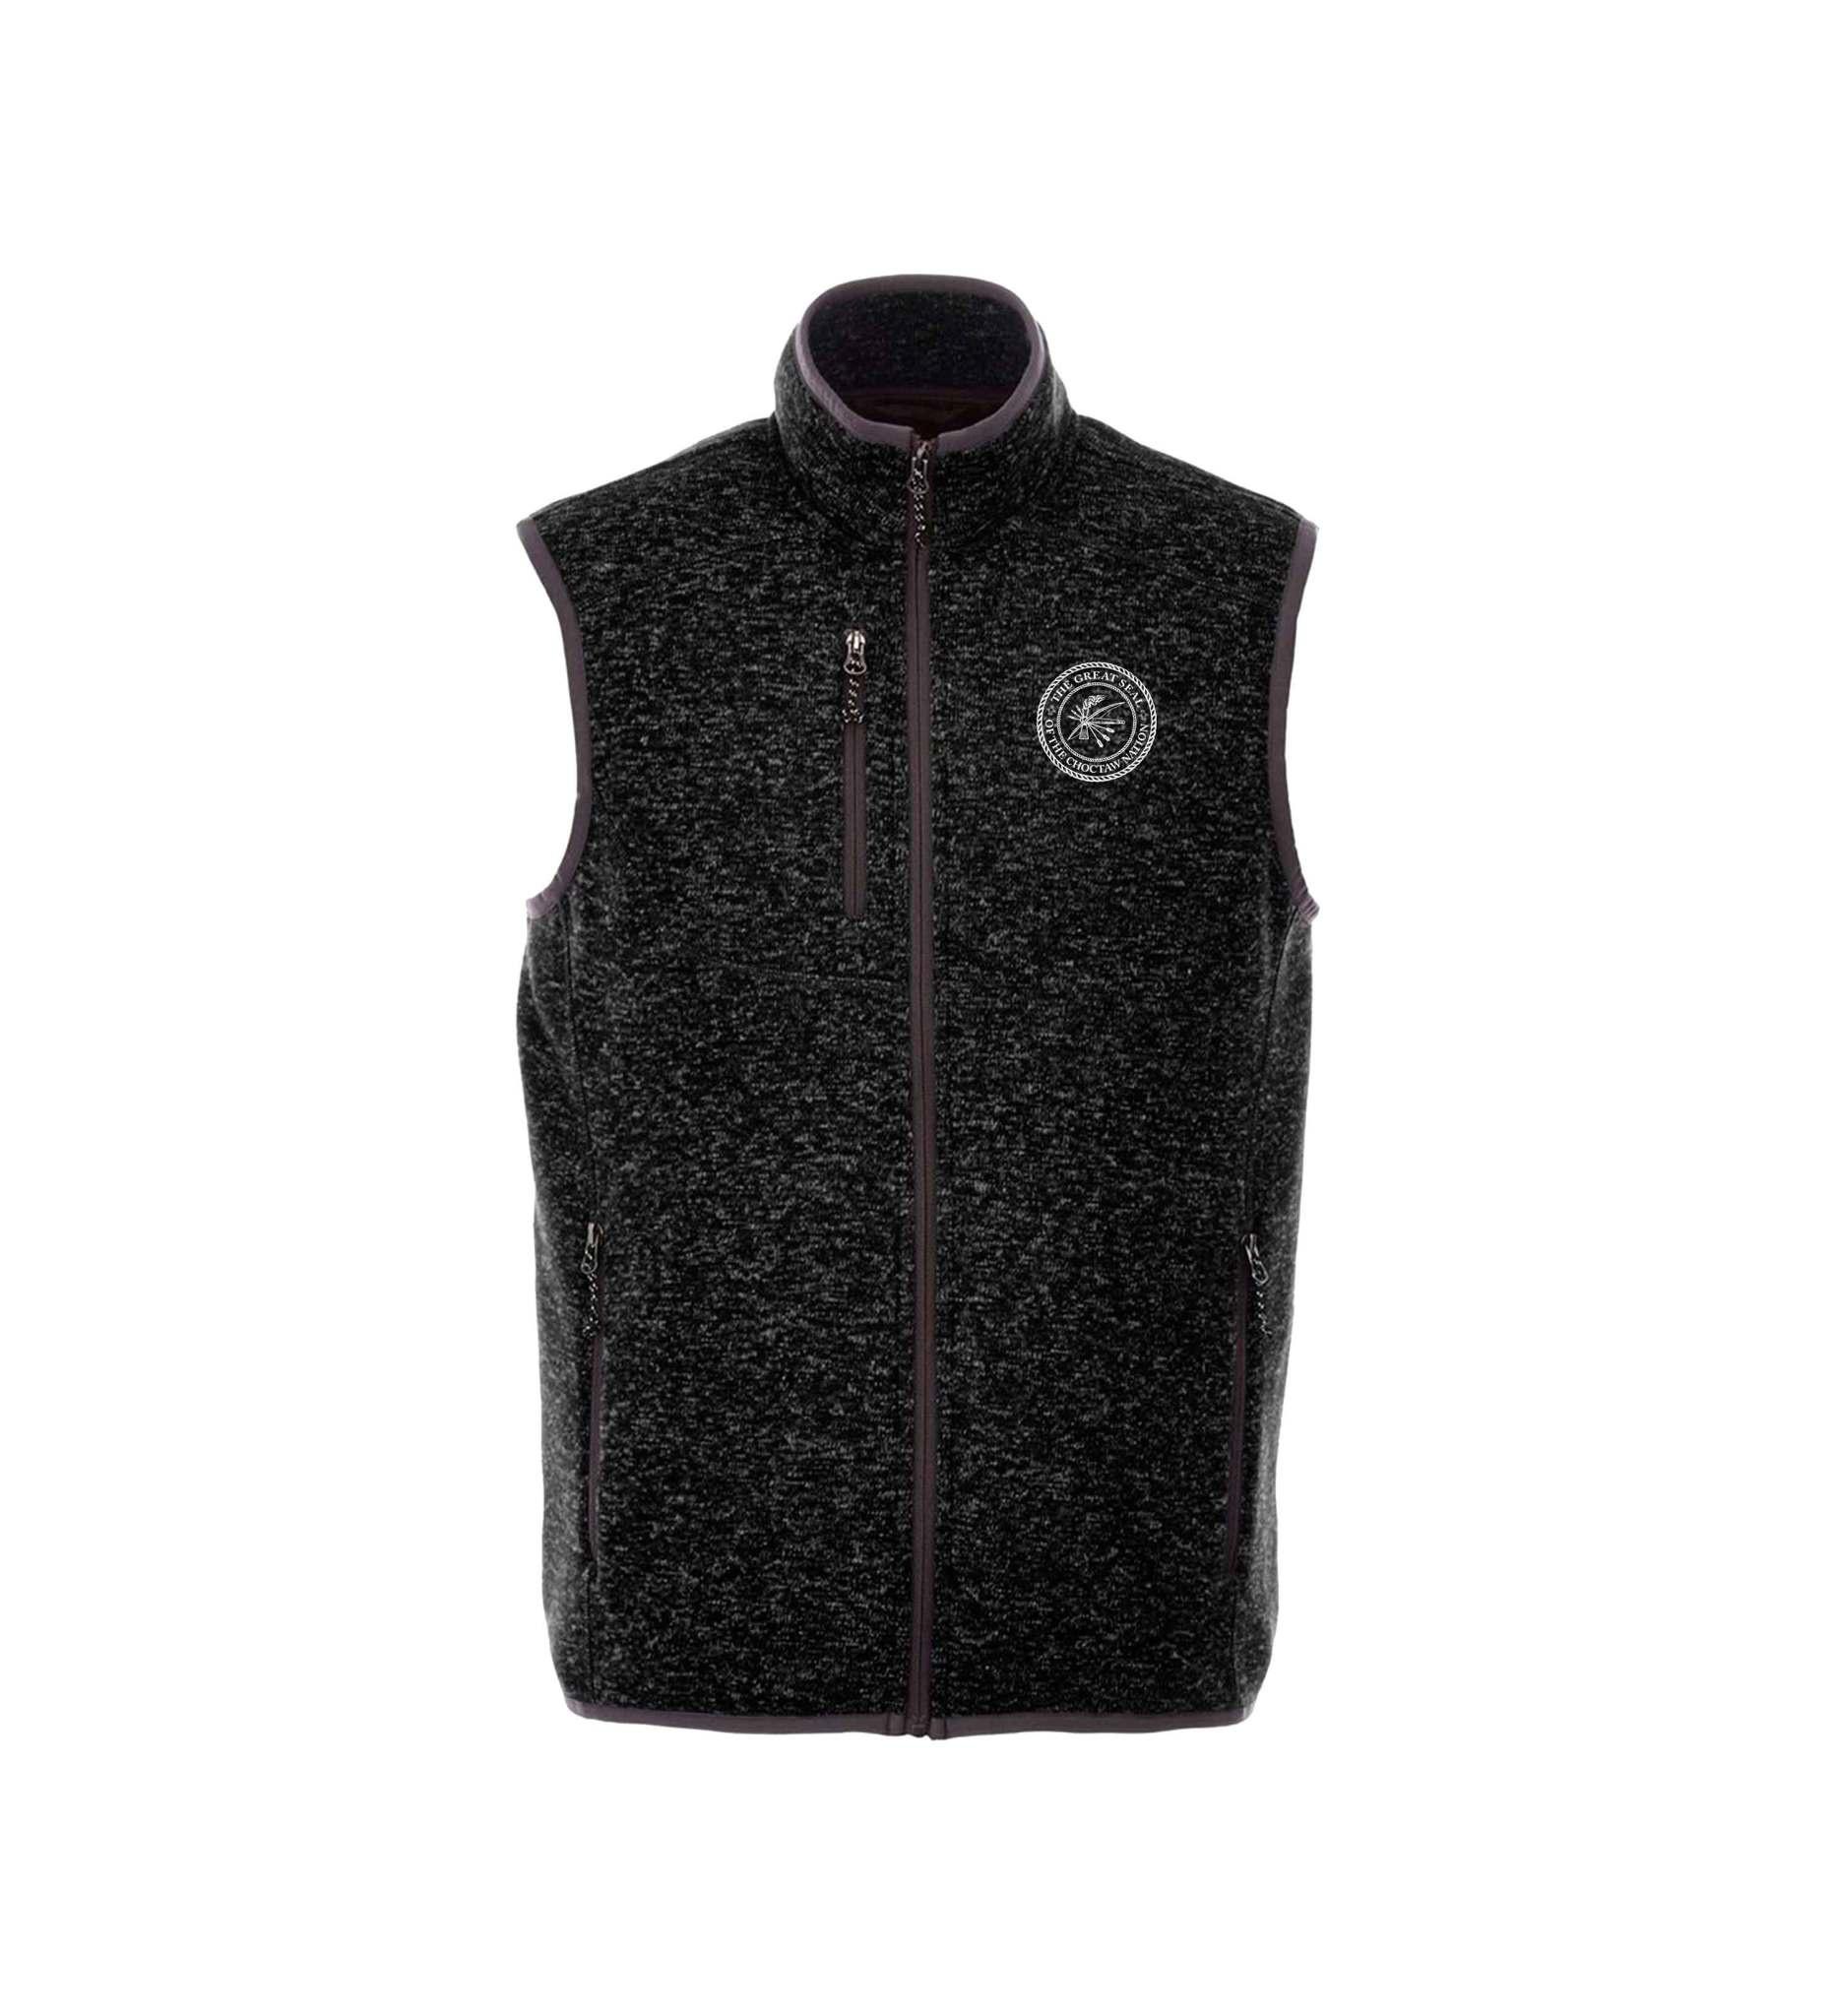 Black Heather Knit Vest w/CNO Seal